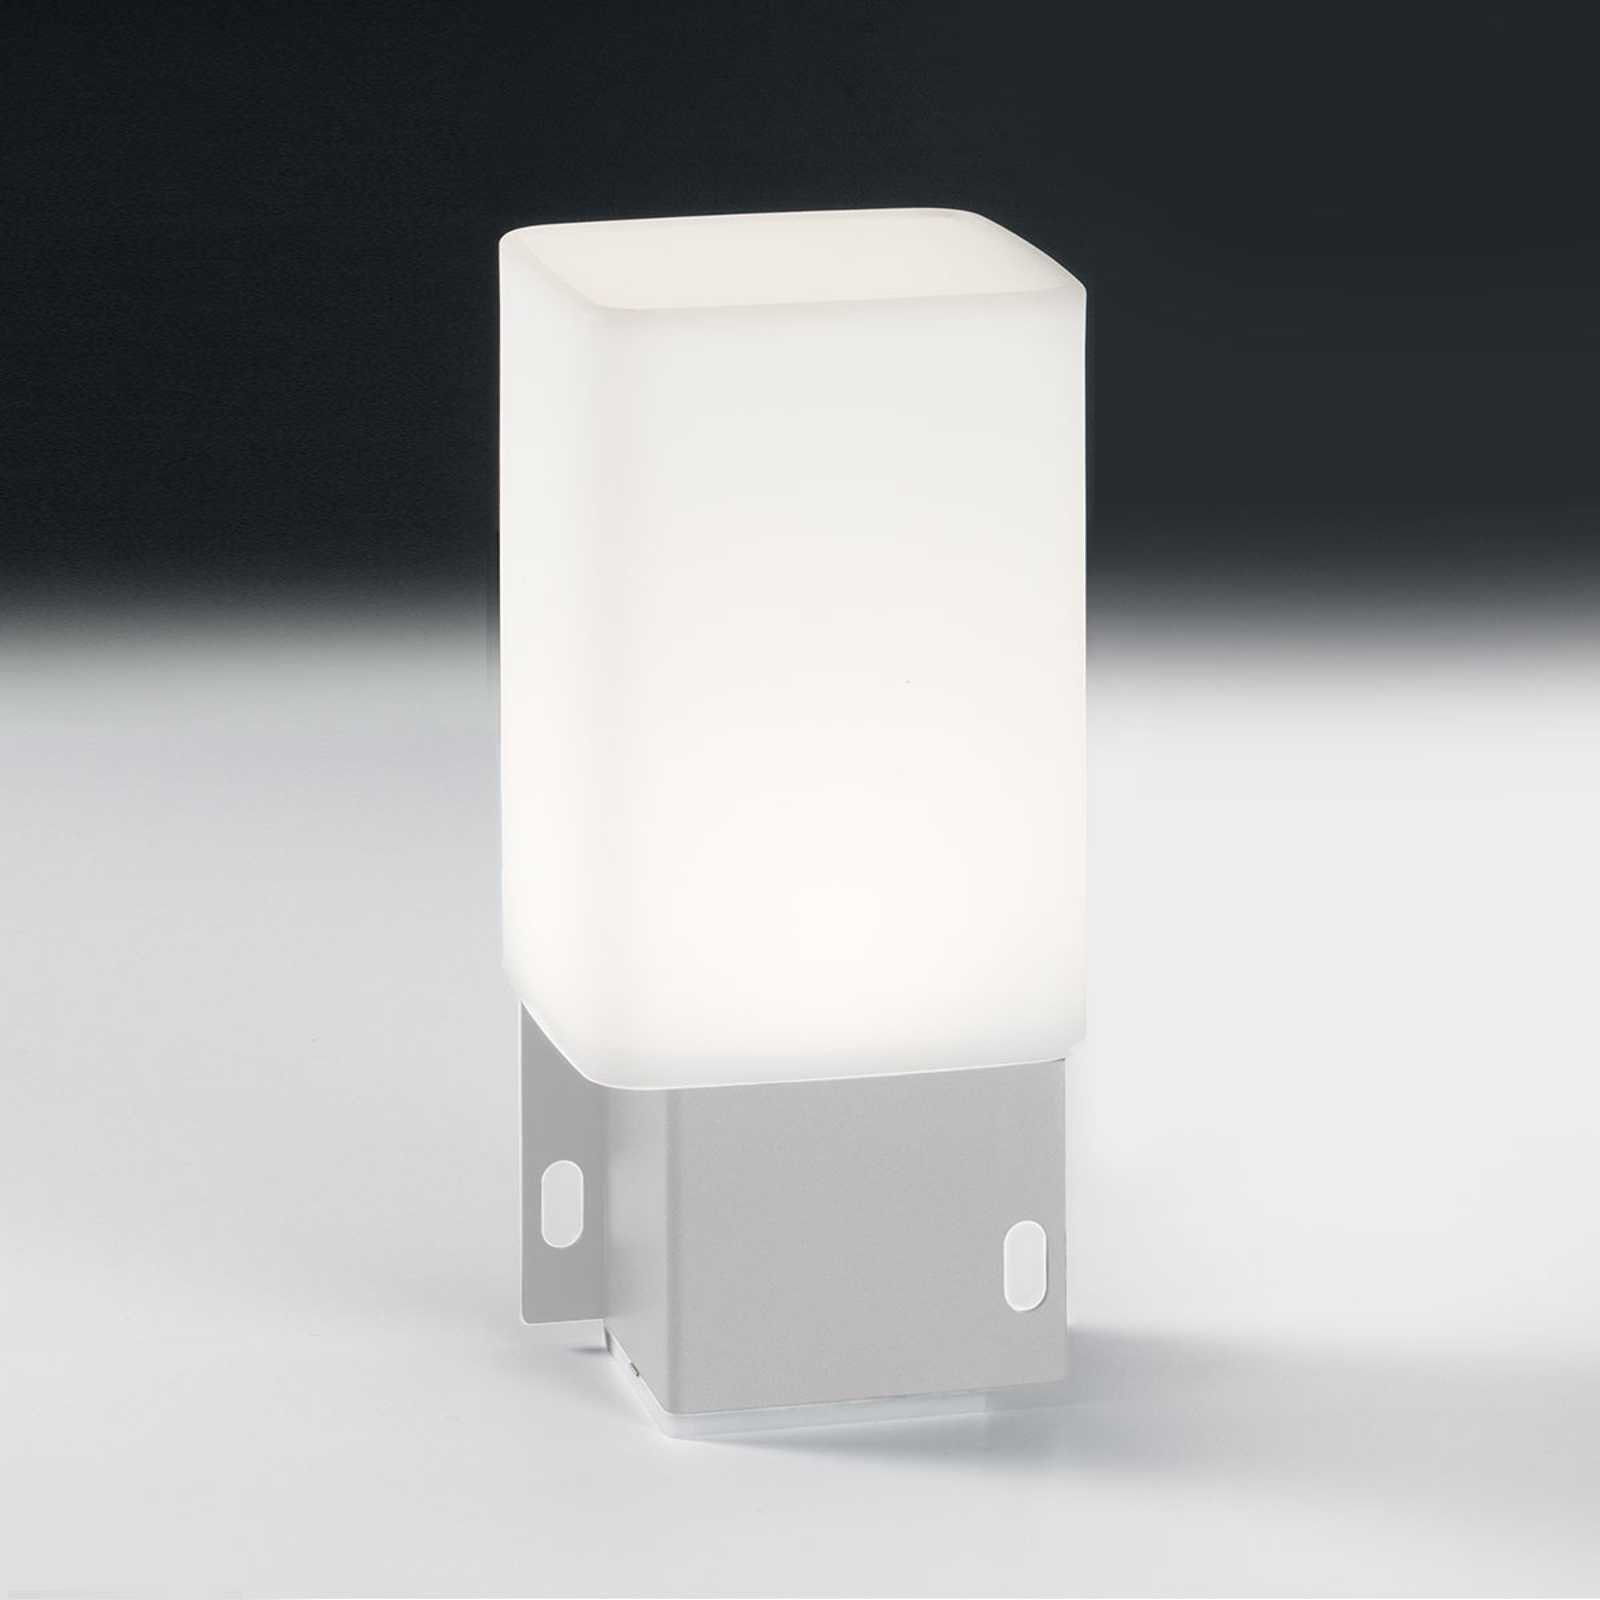 LED-Außendekolampe Cuadrat - 1-fach-USB, weiß